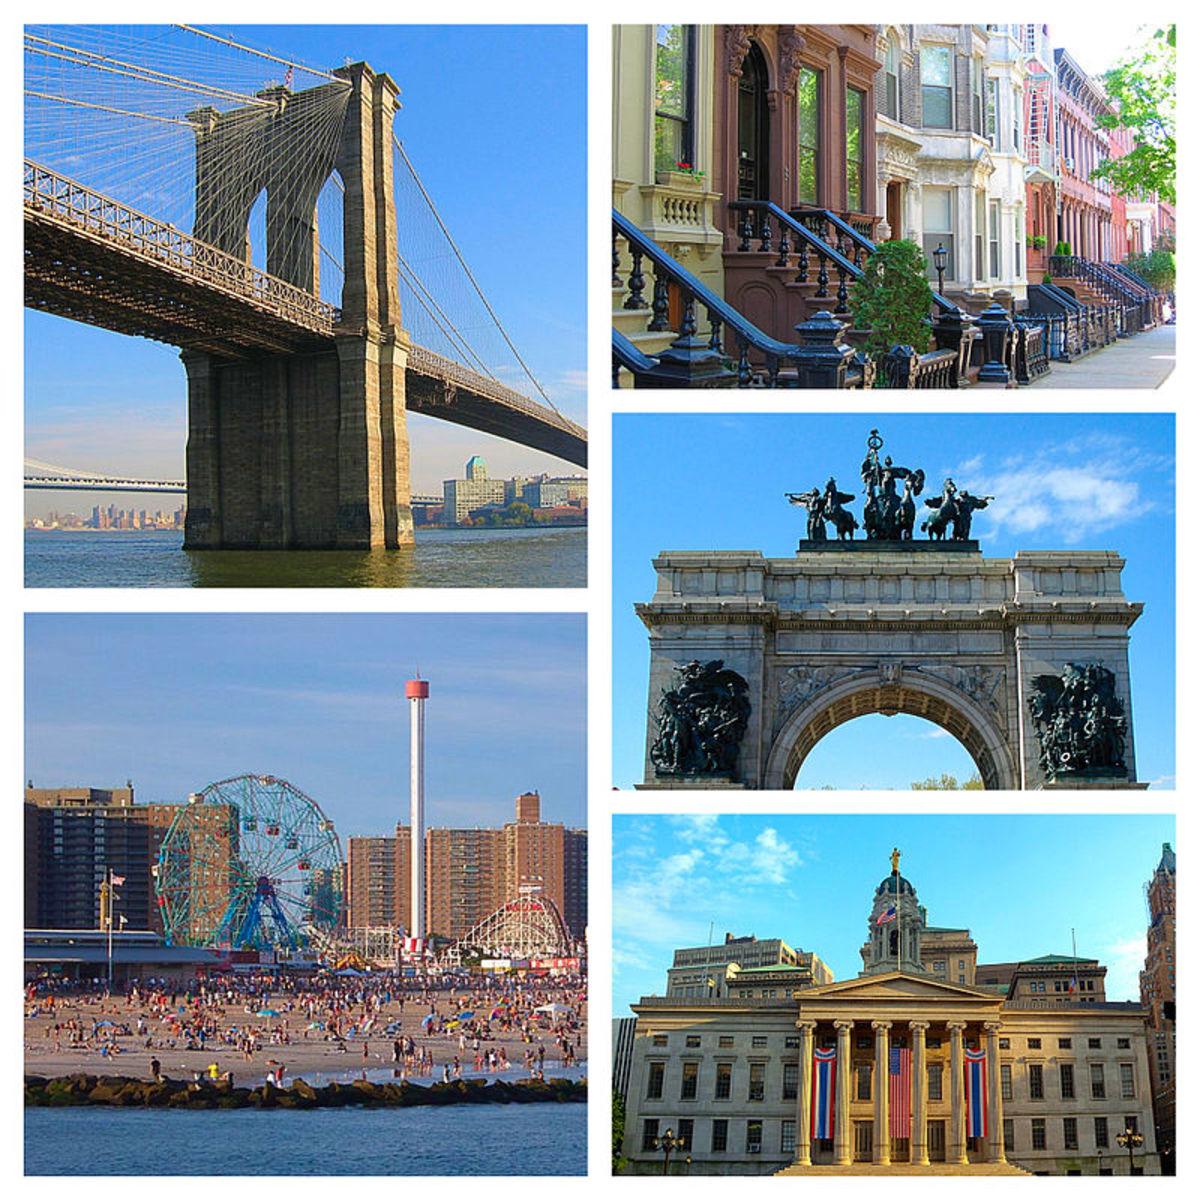 In The City We Became, N.K. Jesmin sold me The Brooklyn Bridge